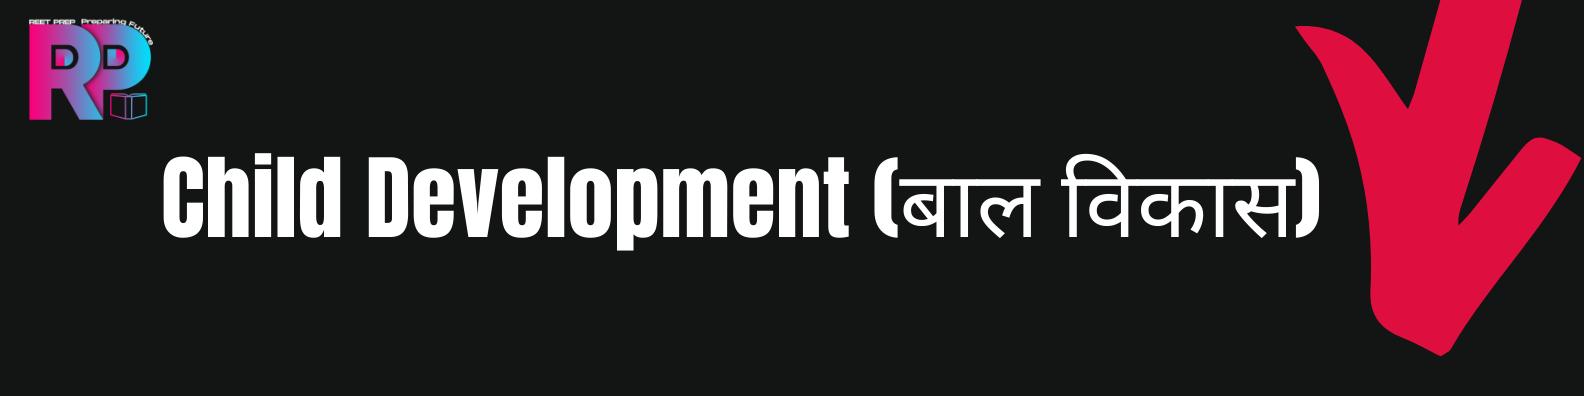 Child Development (बाल विकास)